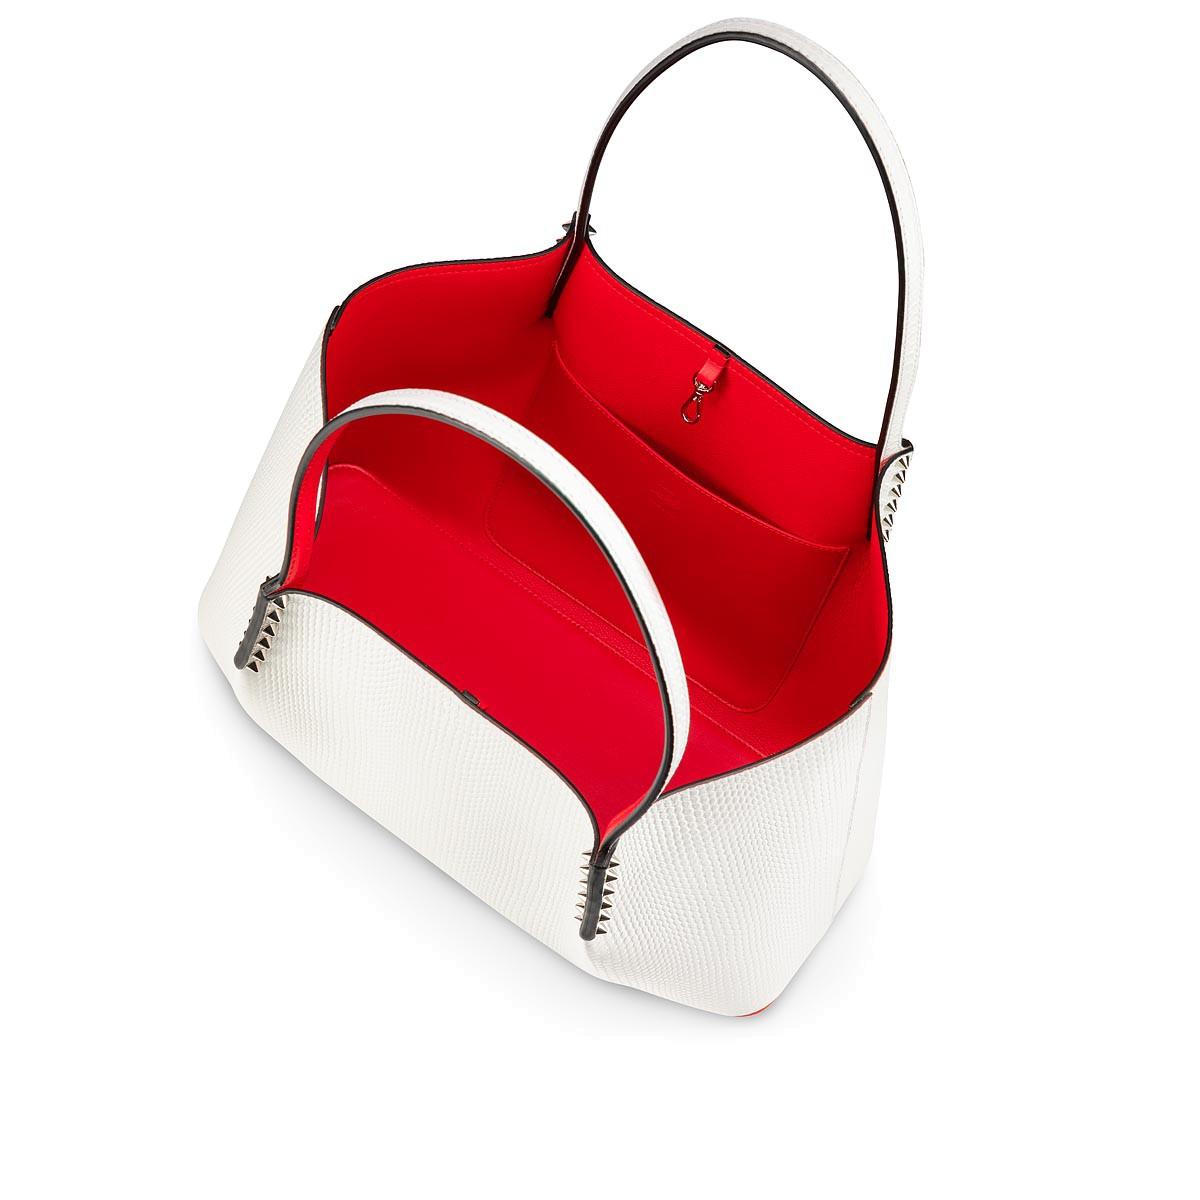 Bags - Cabarock Large Tote Bag - Christian Louboutin